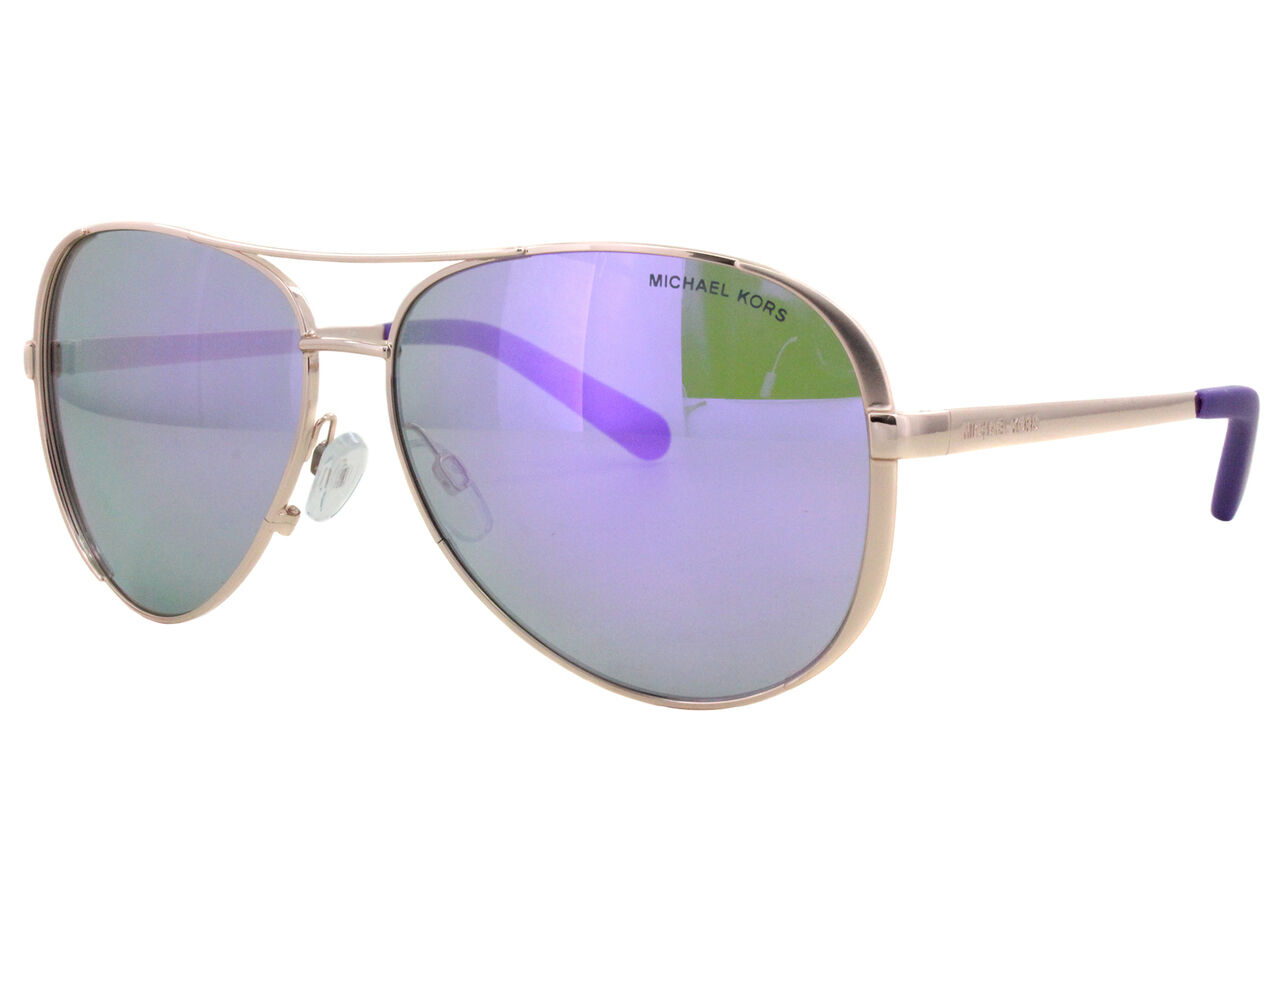 58300d49b6dd NWT Michael Kors Sunglasses MK 5004 10034V Rose Gold/Mirrored Purple ...